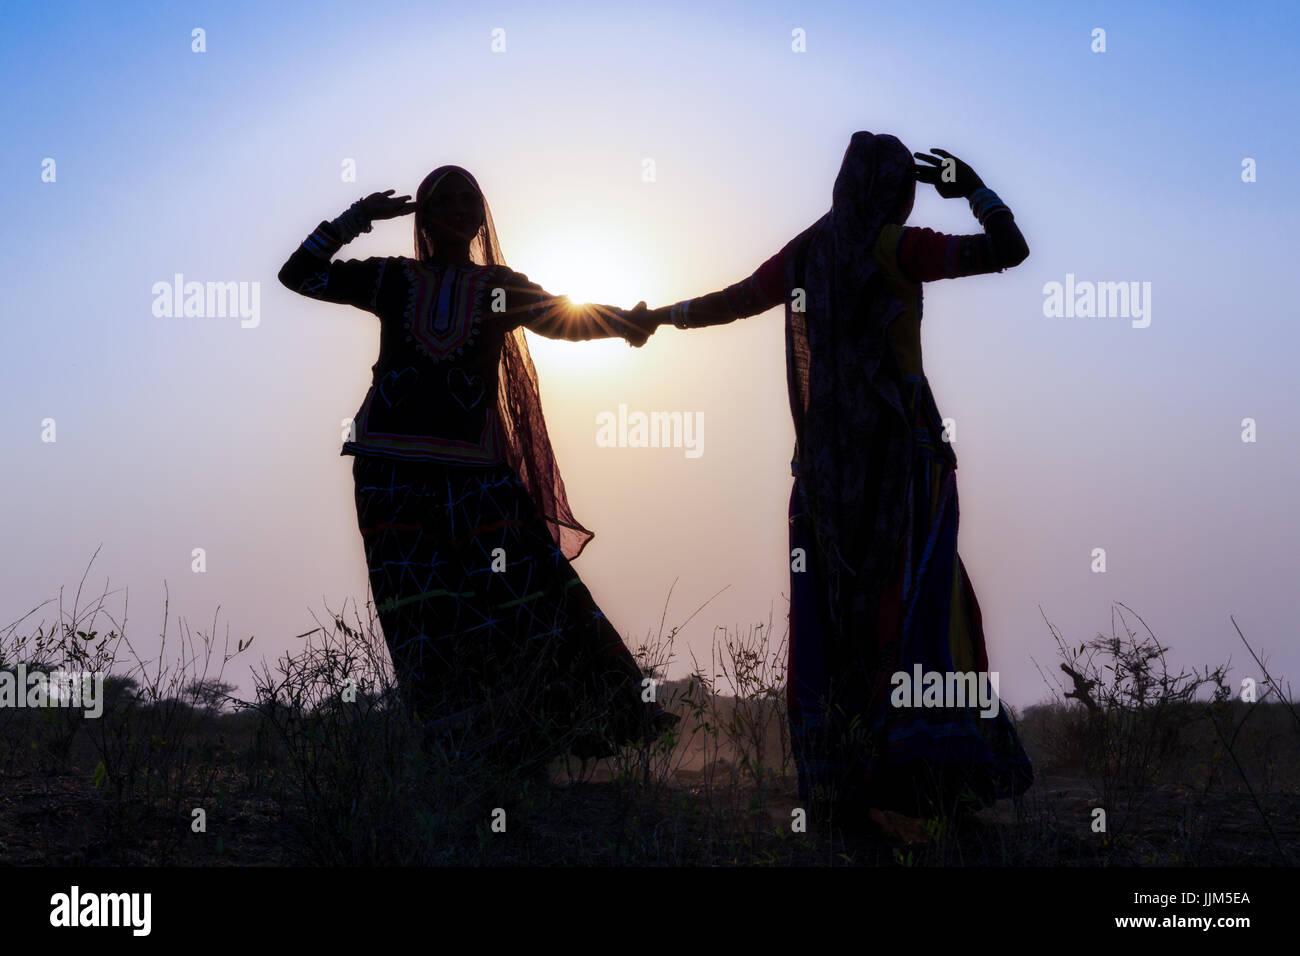 Two gypsy women in dresses dancing in front of the setting sun, Pushkar Camel Fair, Pushkar, Rajasthan, India - Stock Image